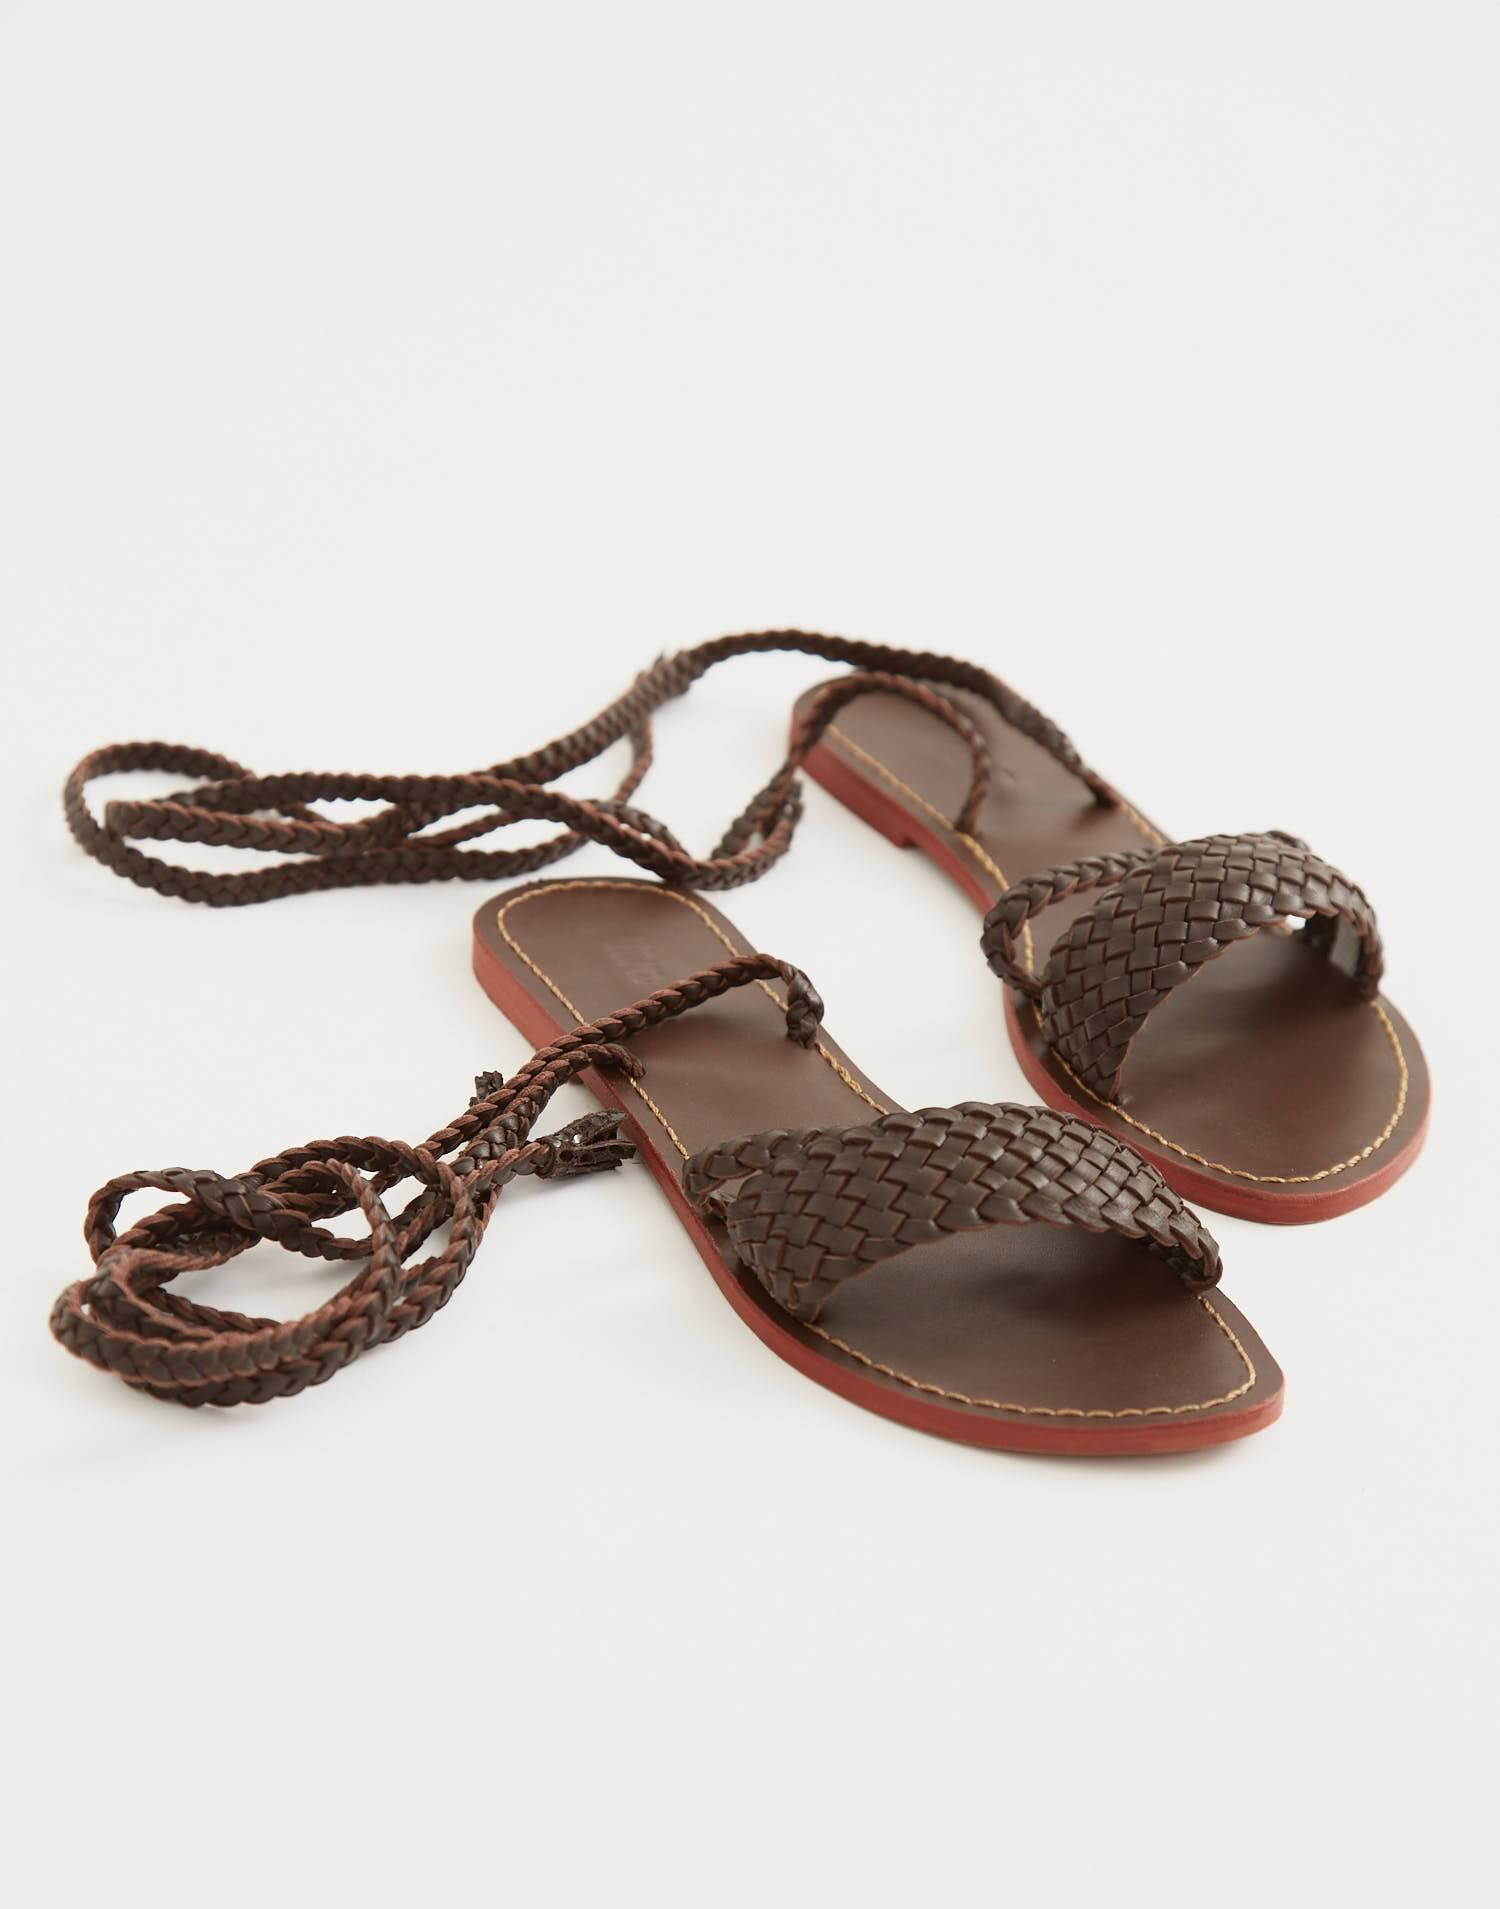 Sandalia piel trenzada atada